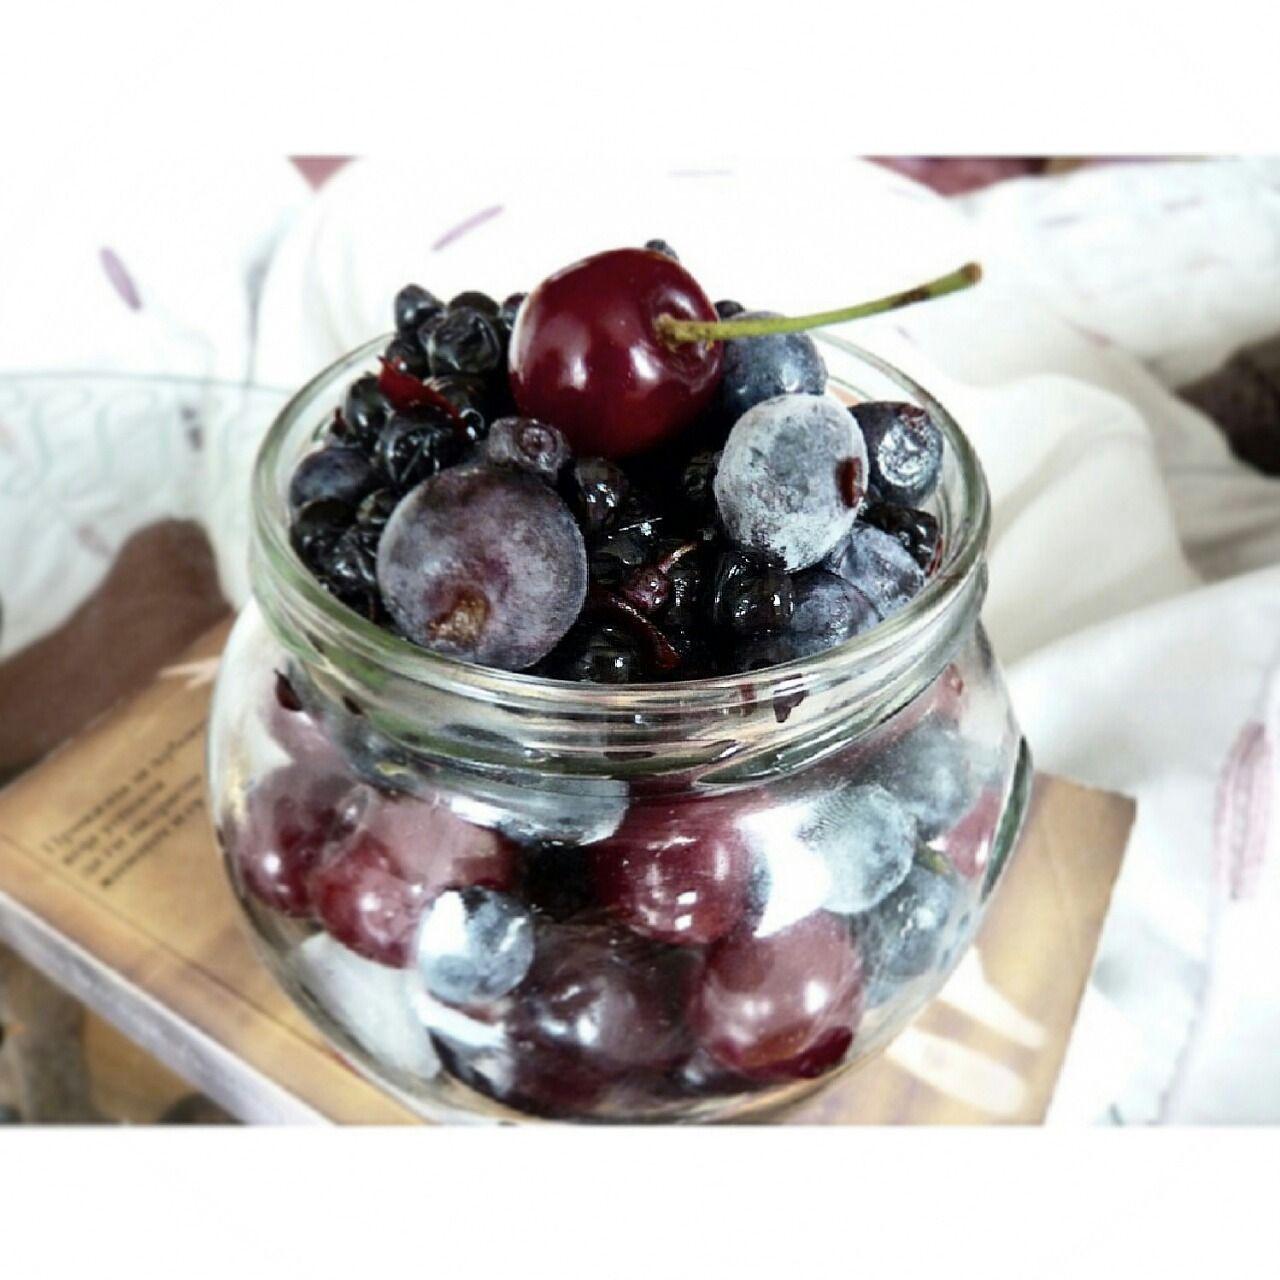 #myberries